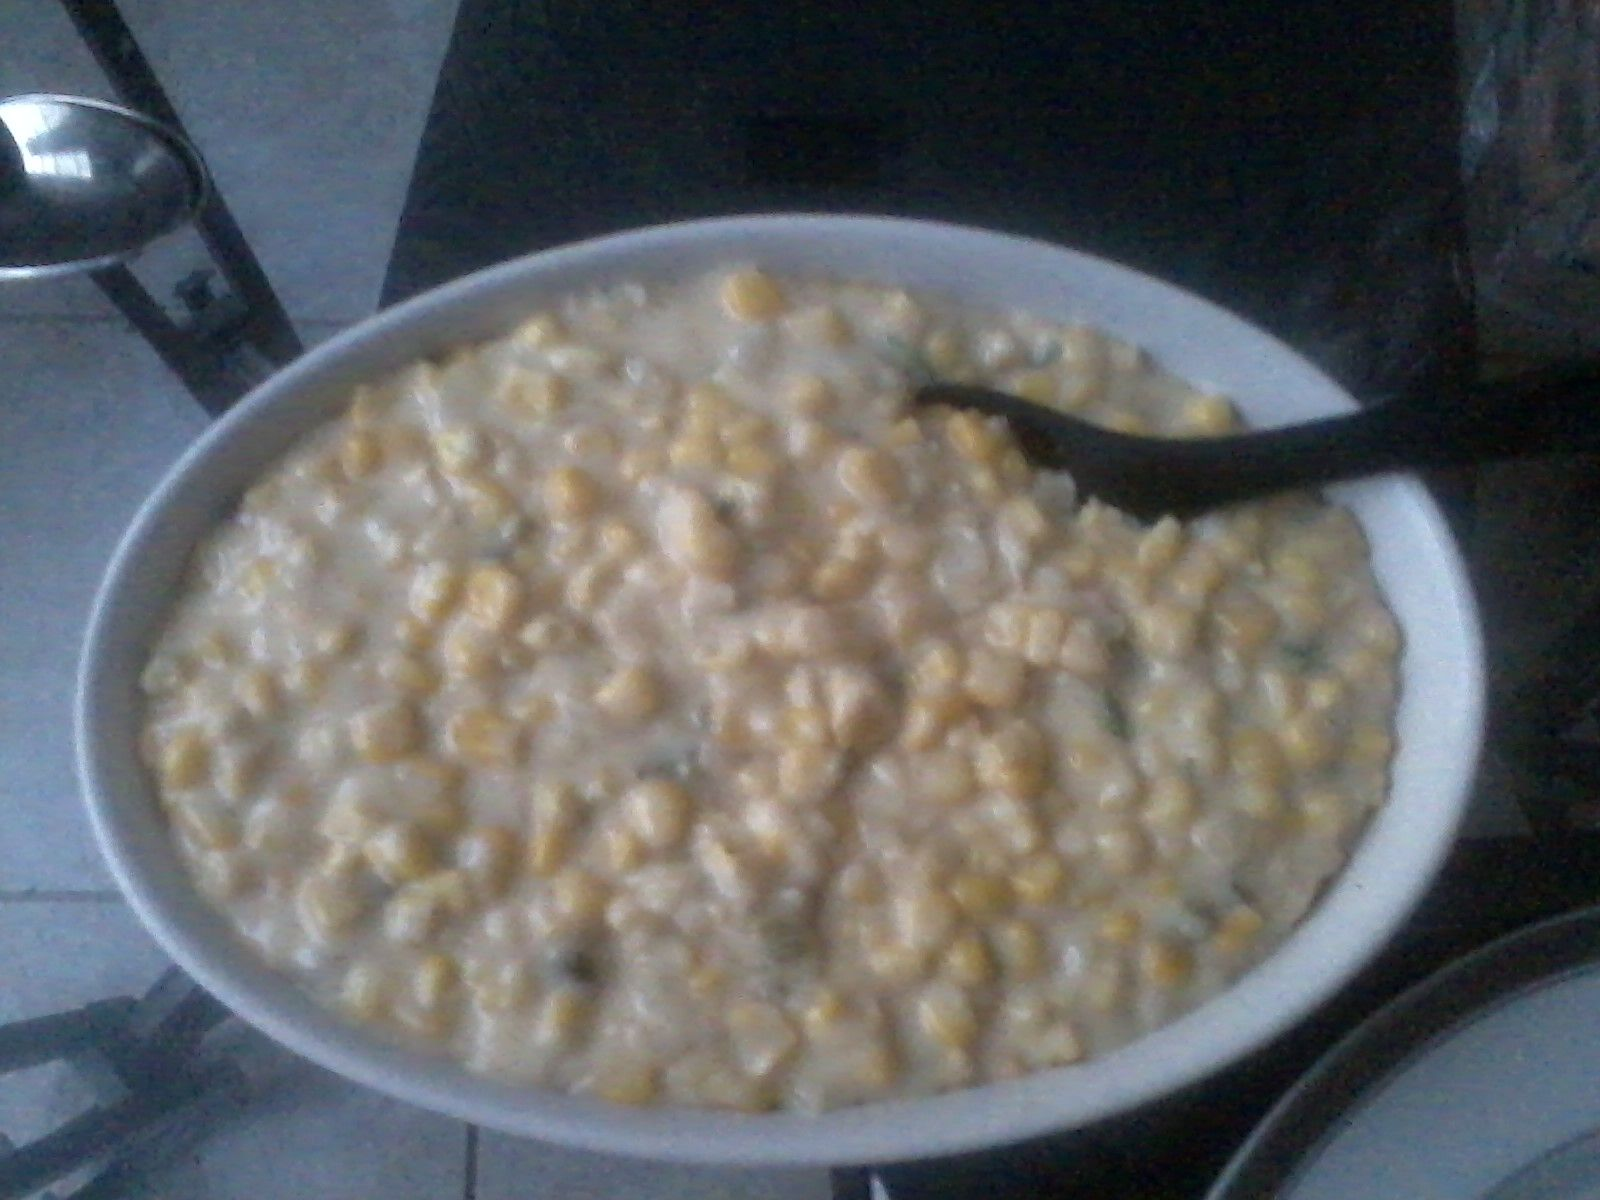 West Texas Creamed Corn